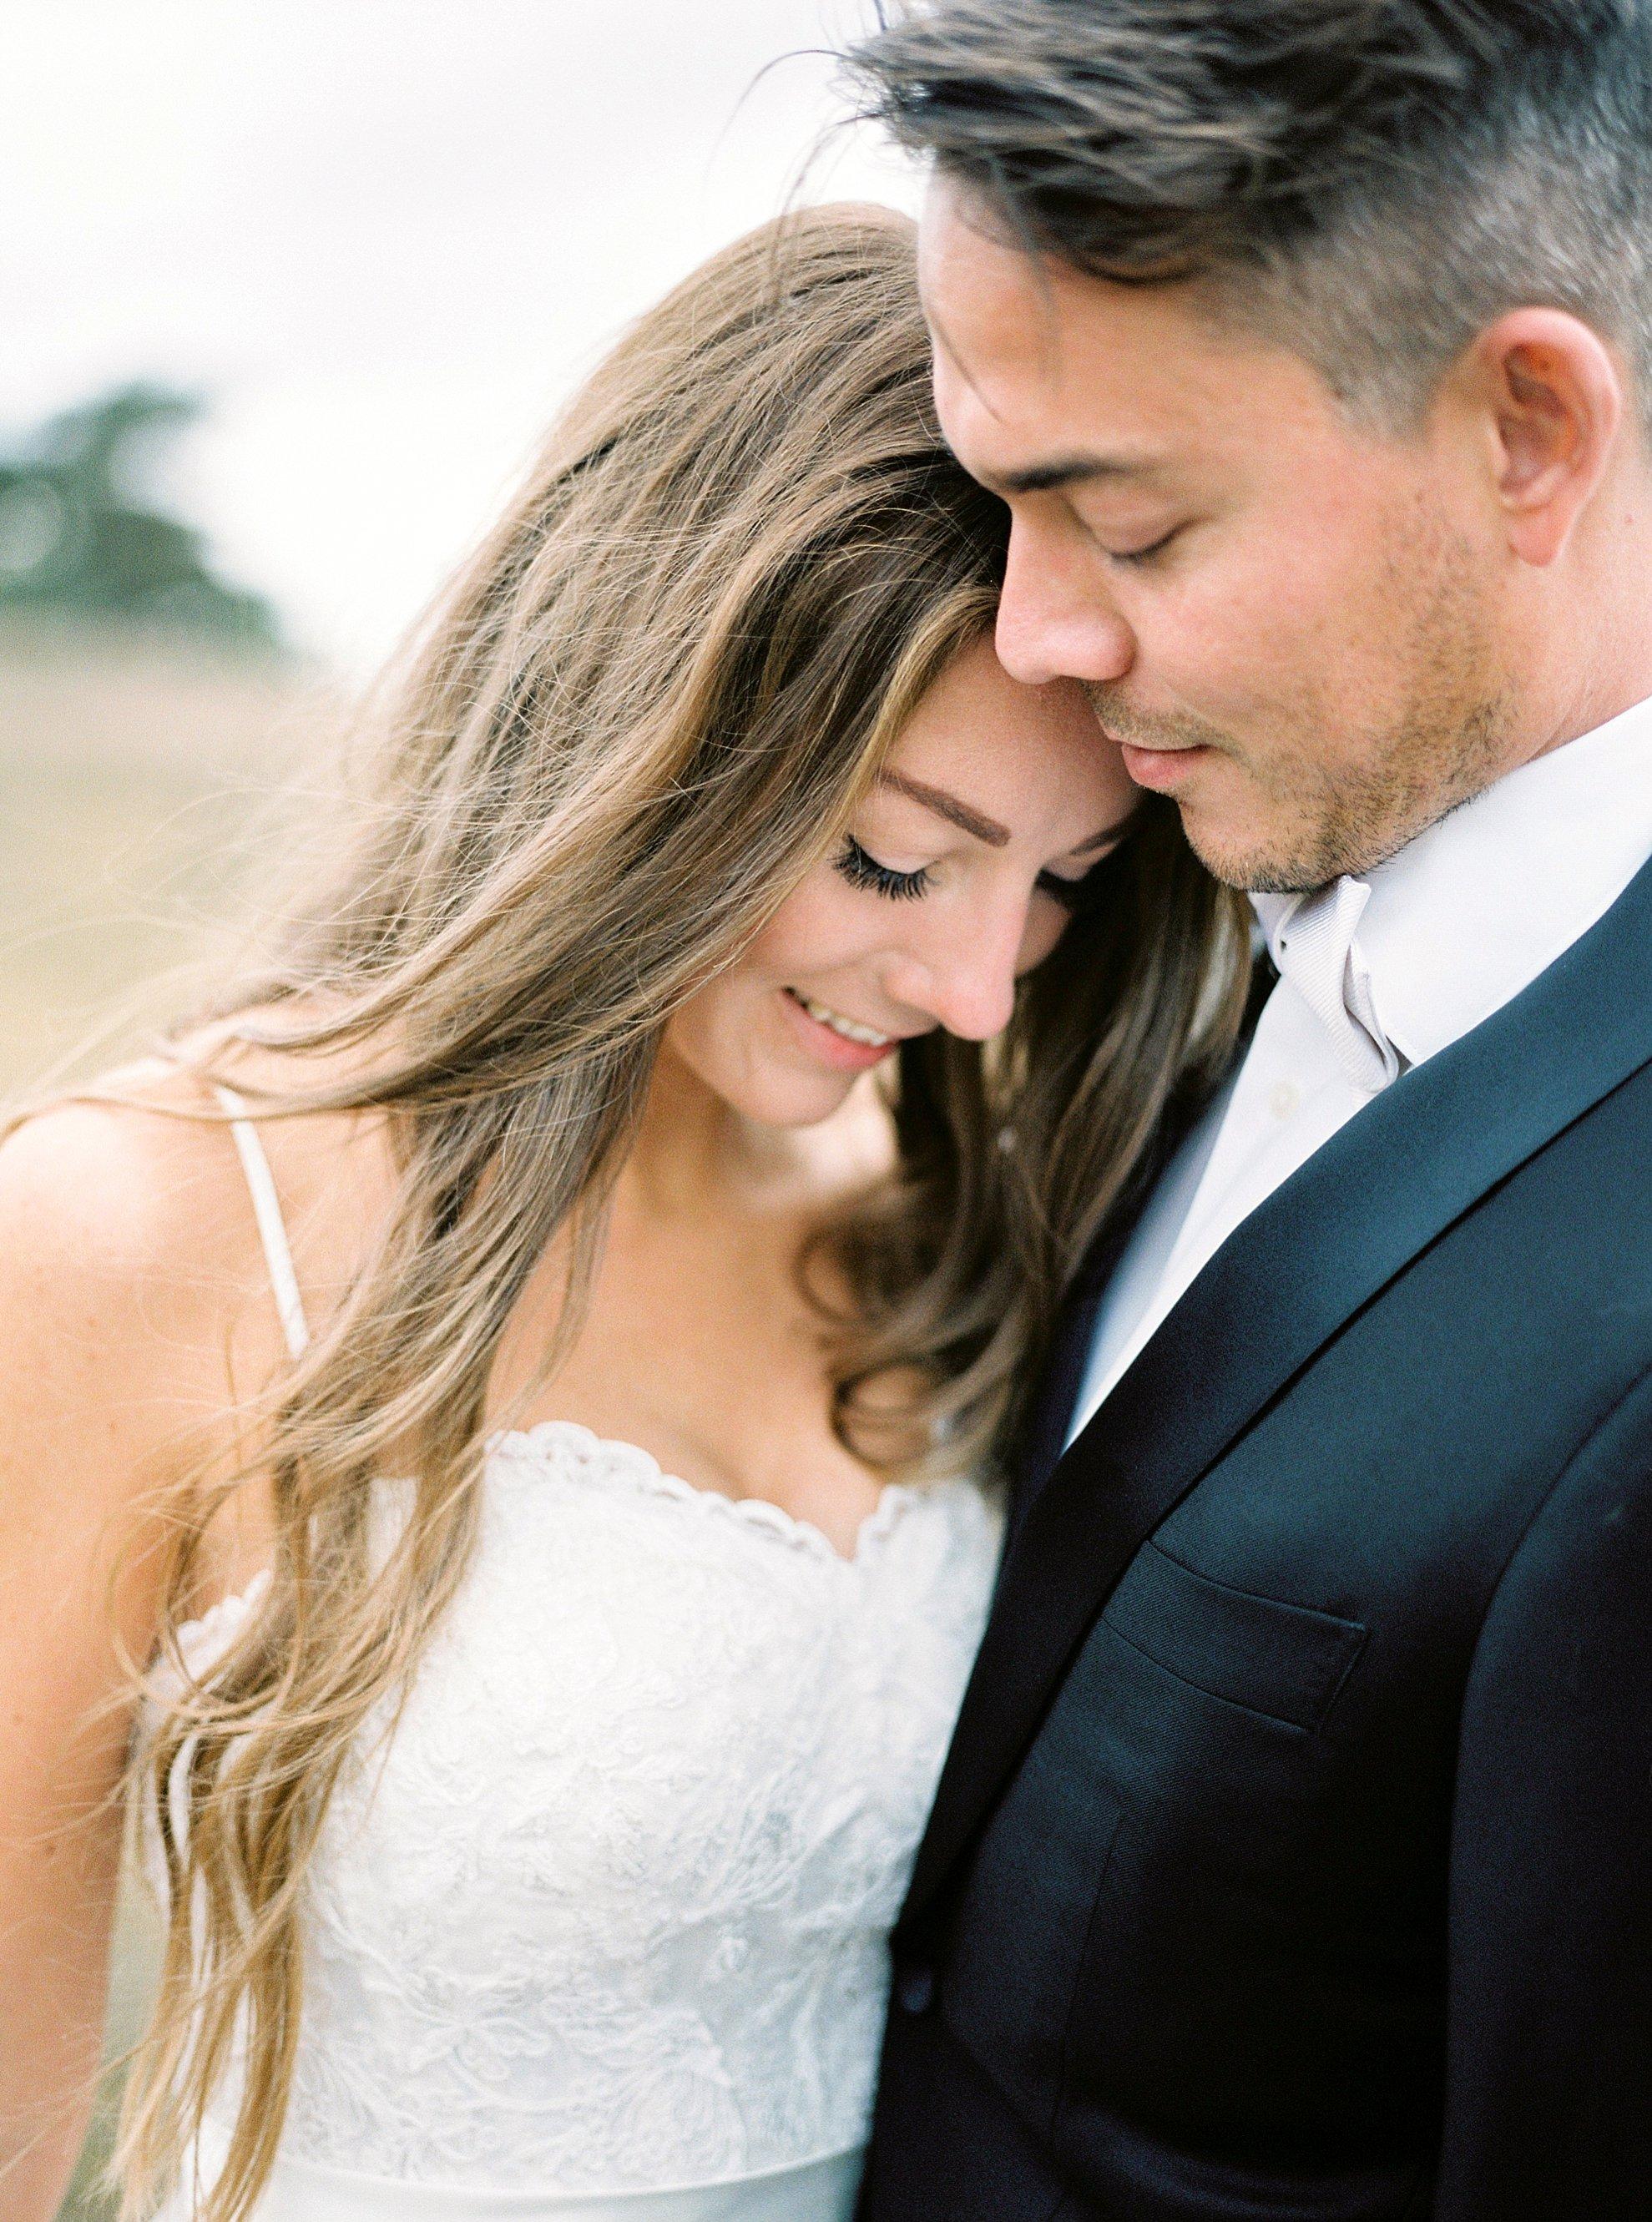 Amanda-Drost-photography-fine-art-nederland-couple-shoot-editorial_0019.jpg